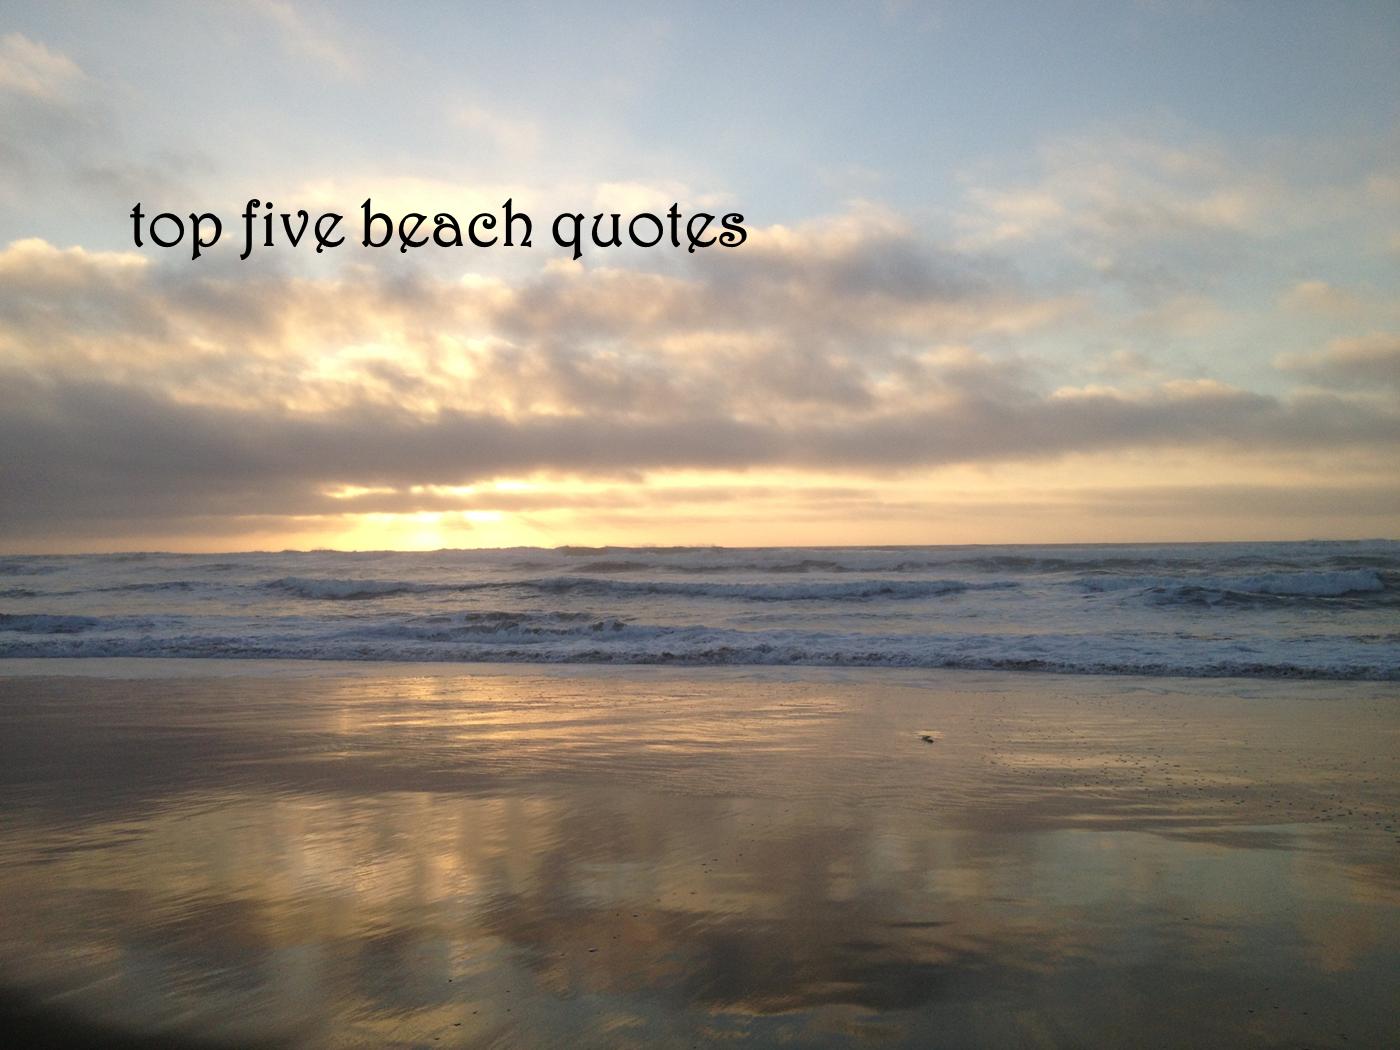 Beach quote #3